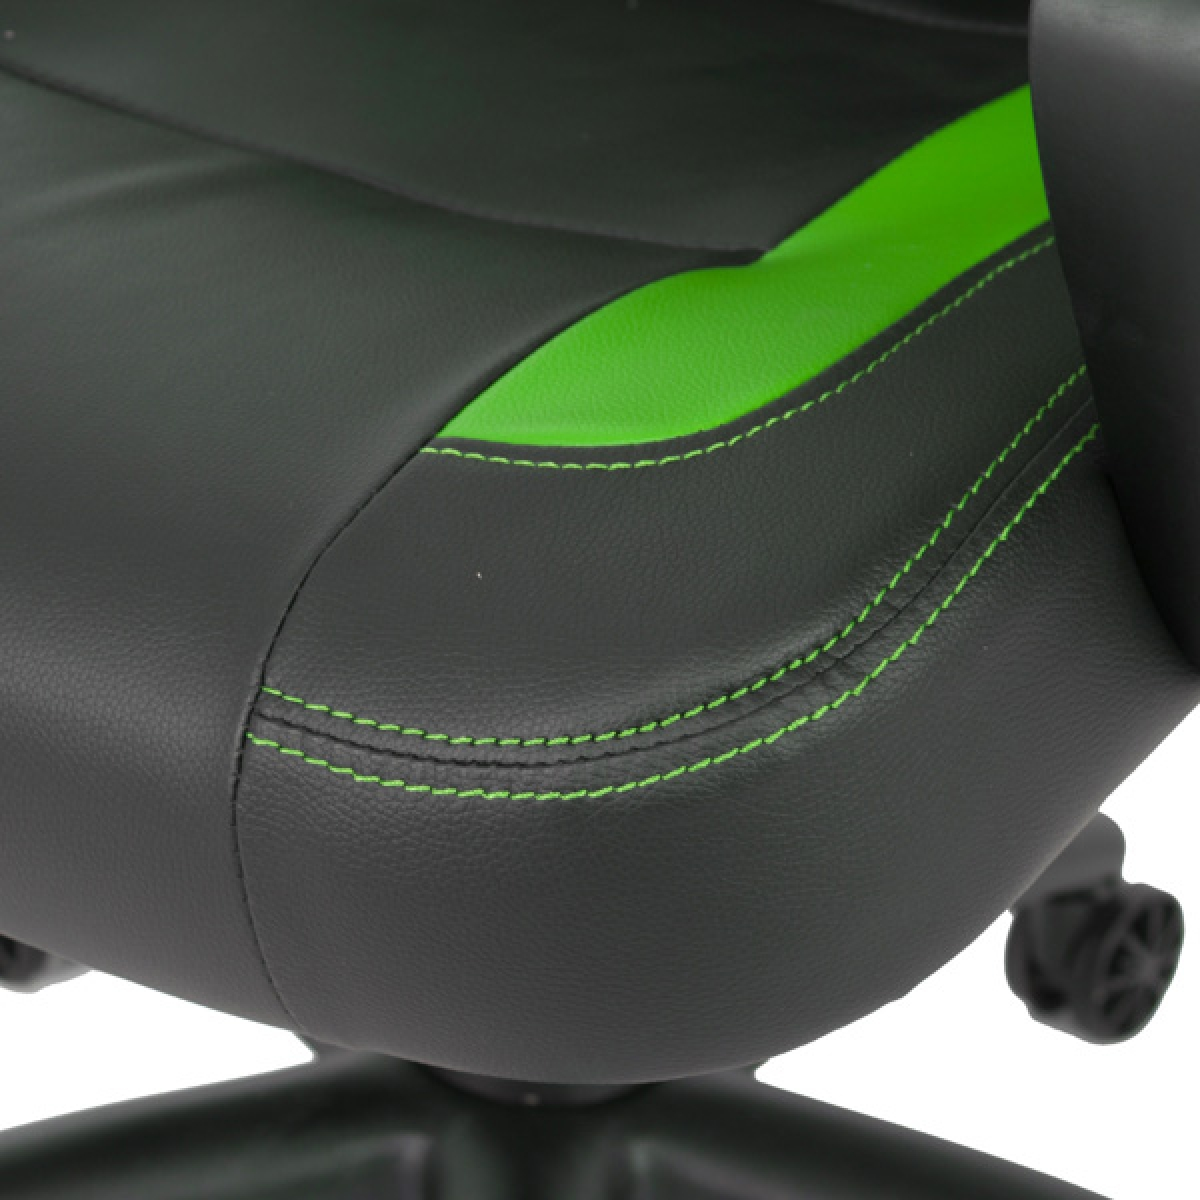 Cadeira Gamer DT3sports GTO, Green V1